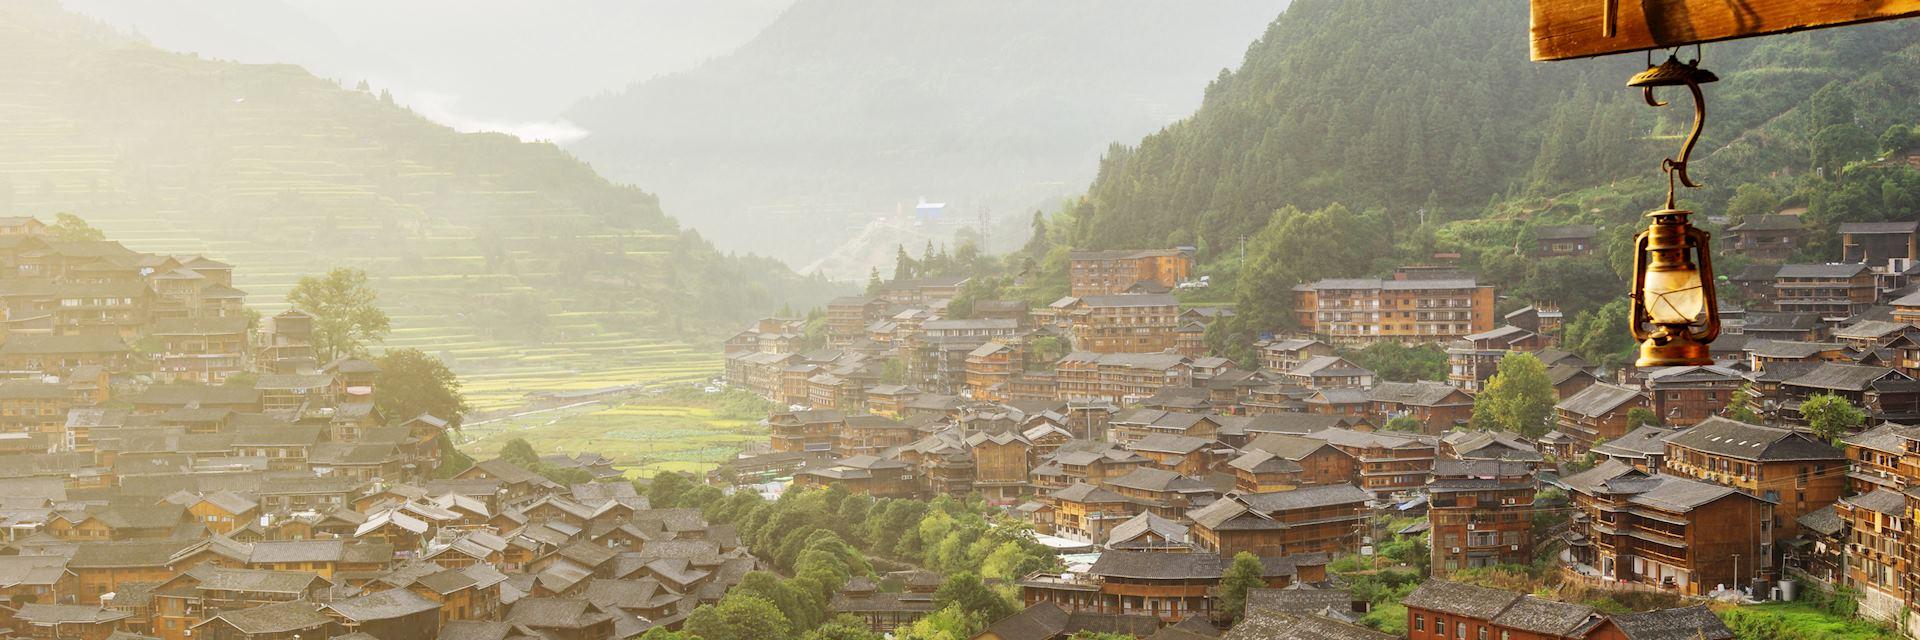 Kaili, China